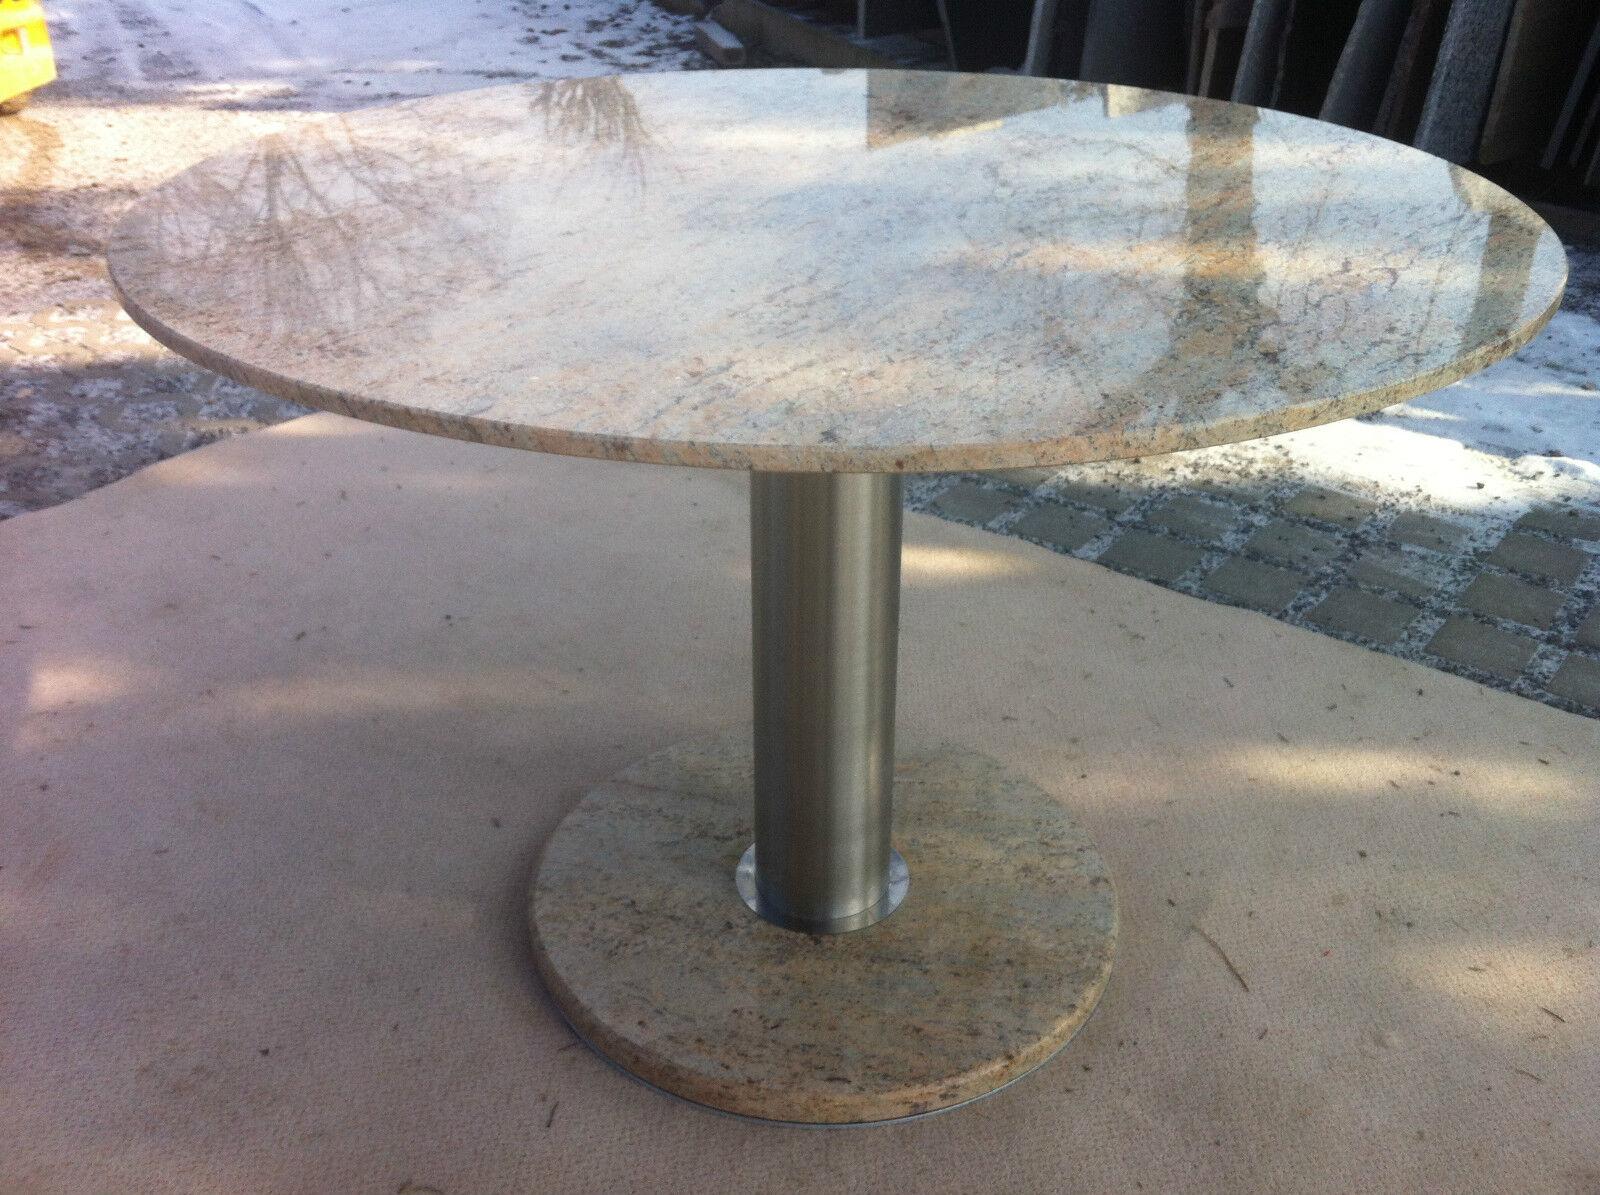 tischplatte arbeitsplatte naturstein marmor granit beige. Black Bedroom Furniture Sets. Home Design Ideas